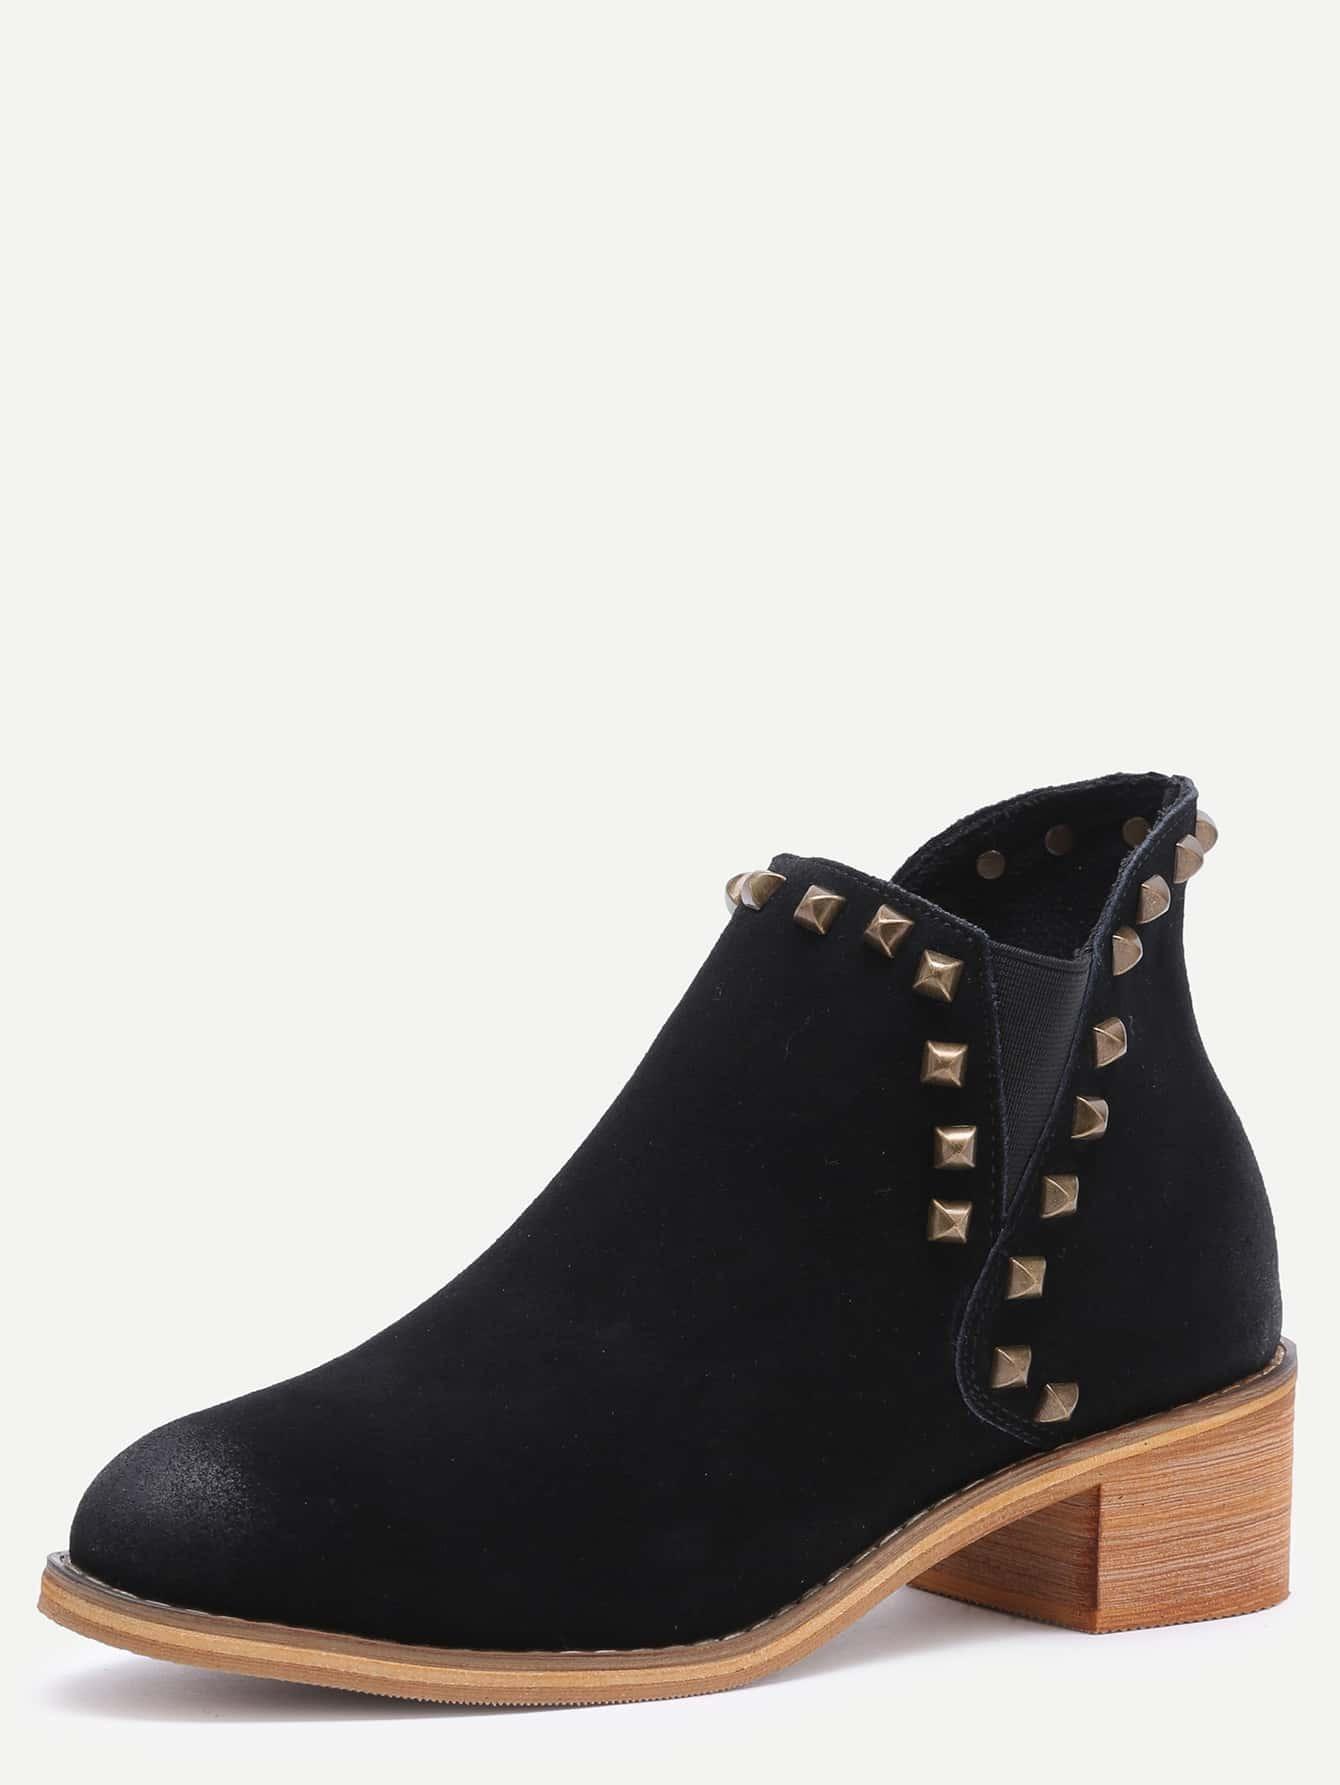 black genuine leather distressed rivet chelsea boots